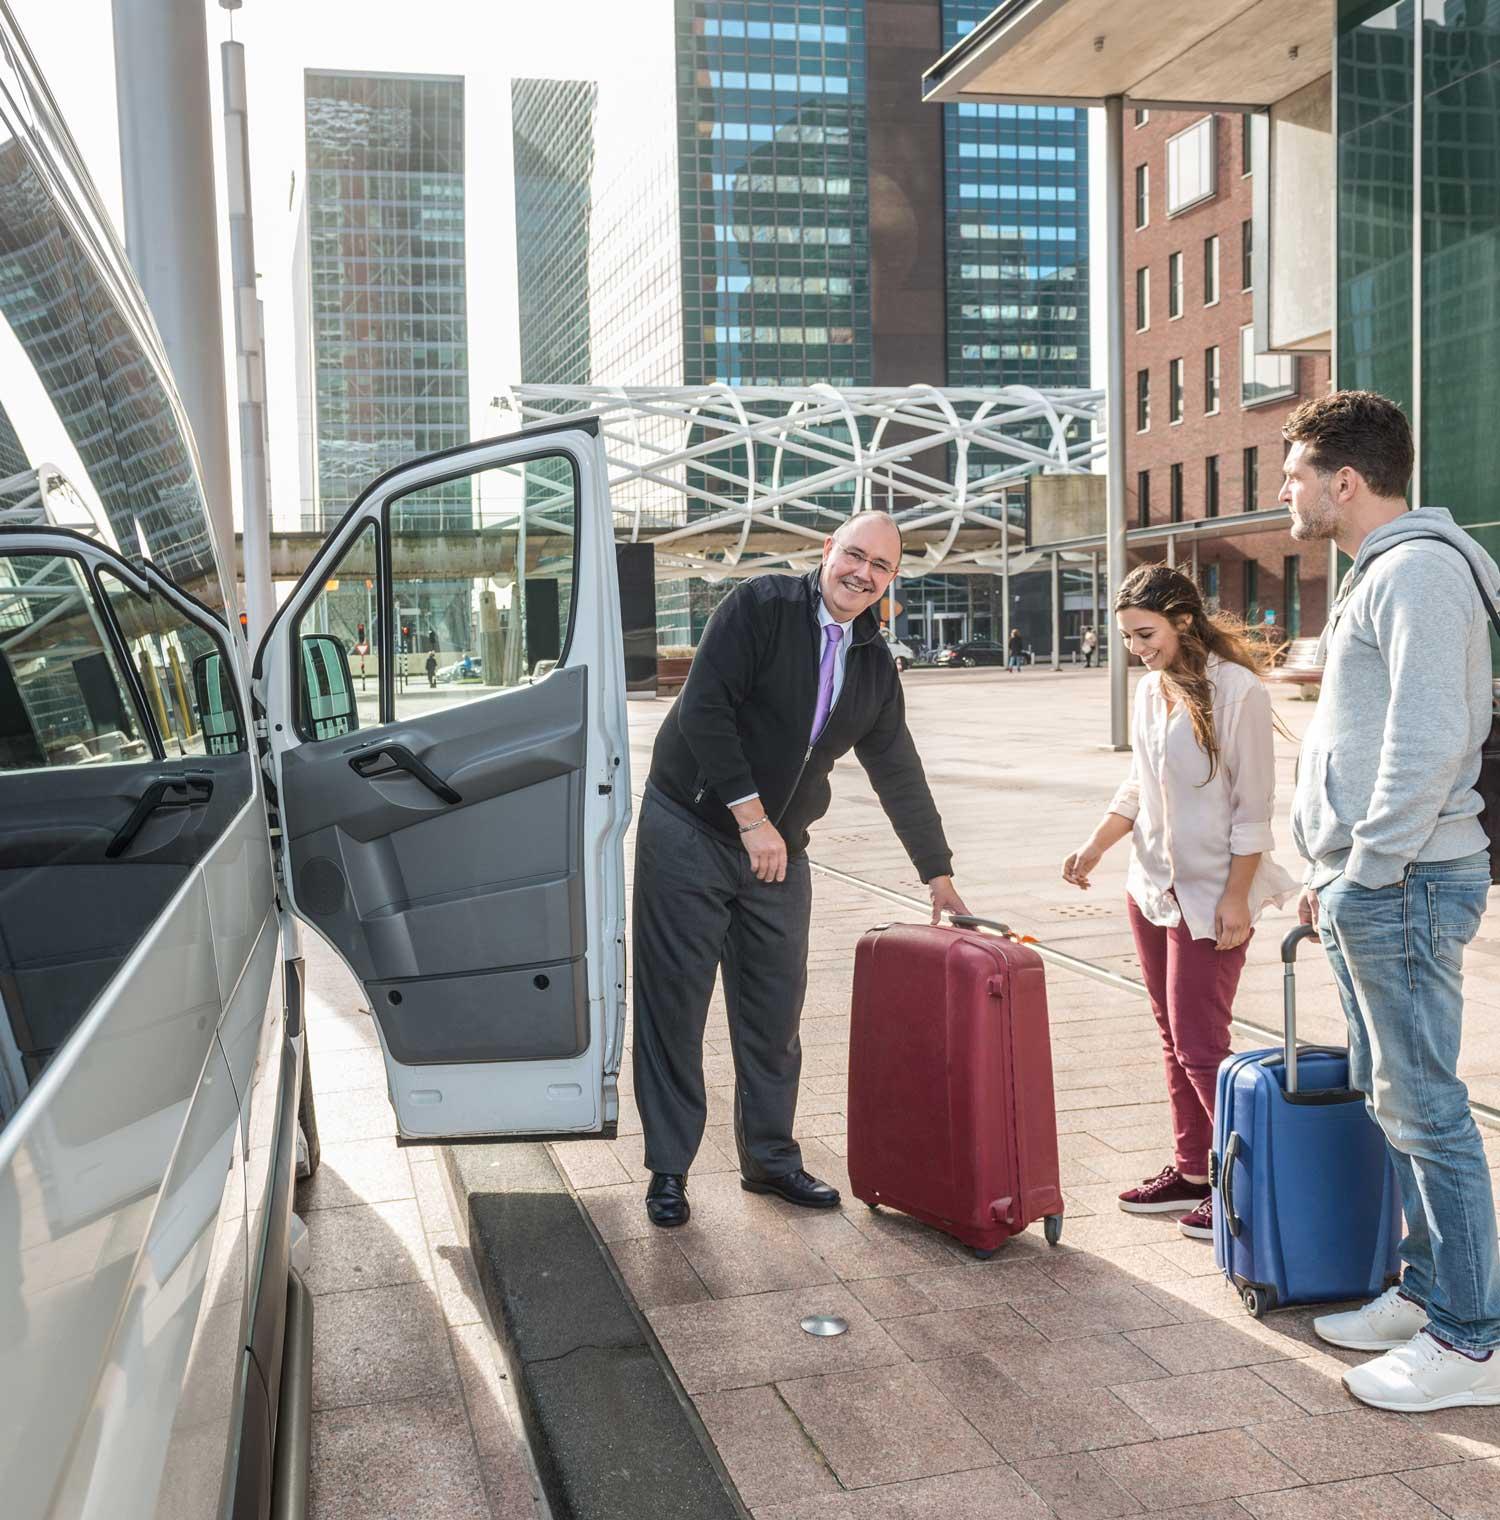 Großraumtaxi Flughafen Frankfurt